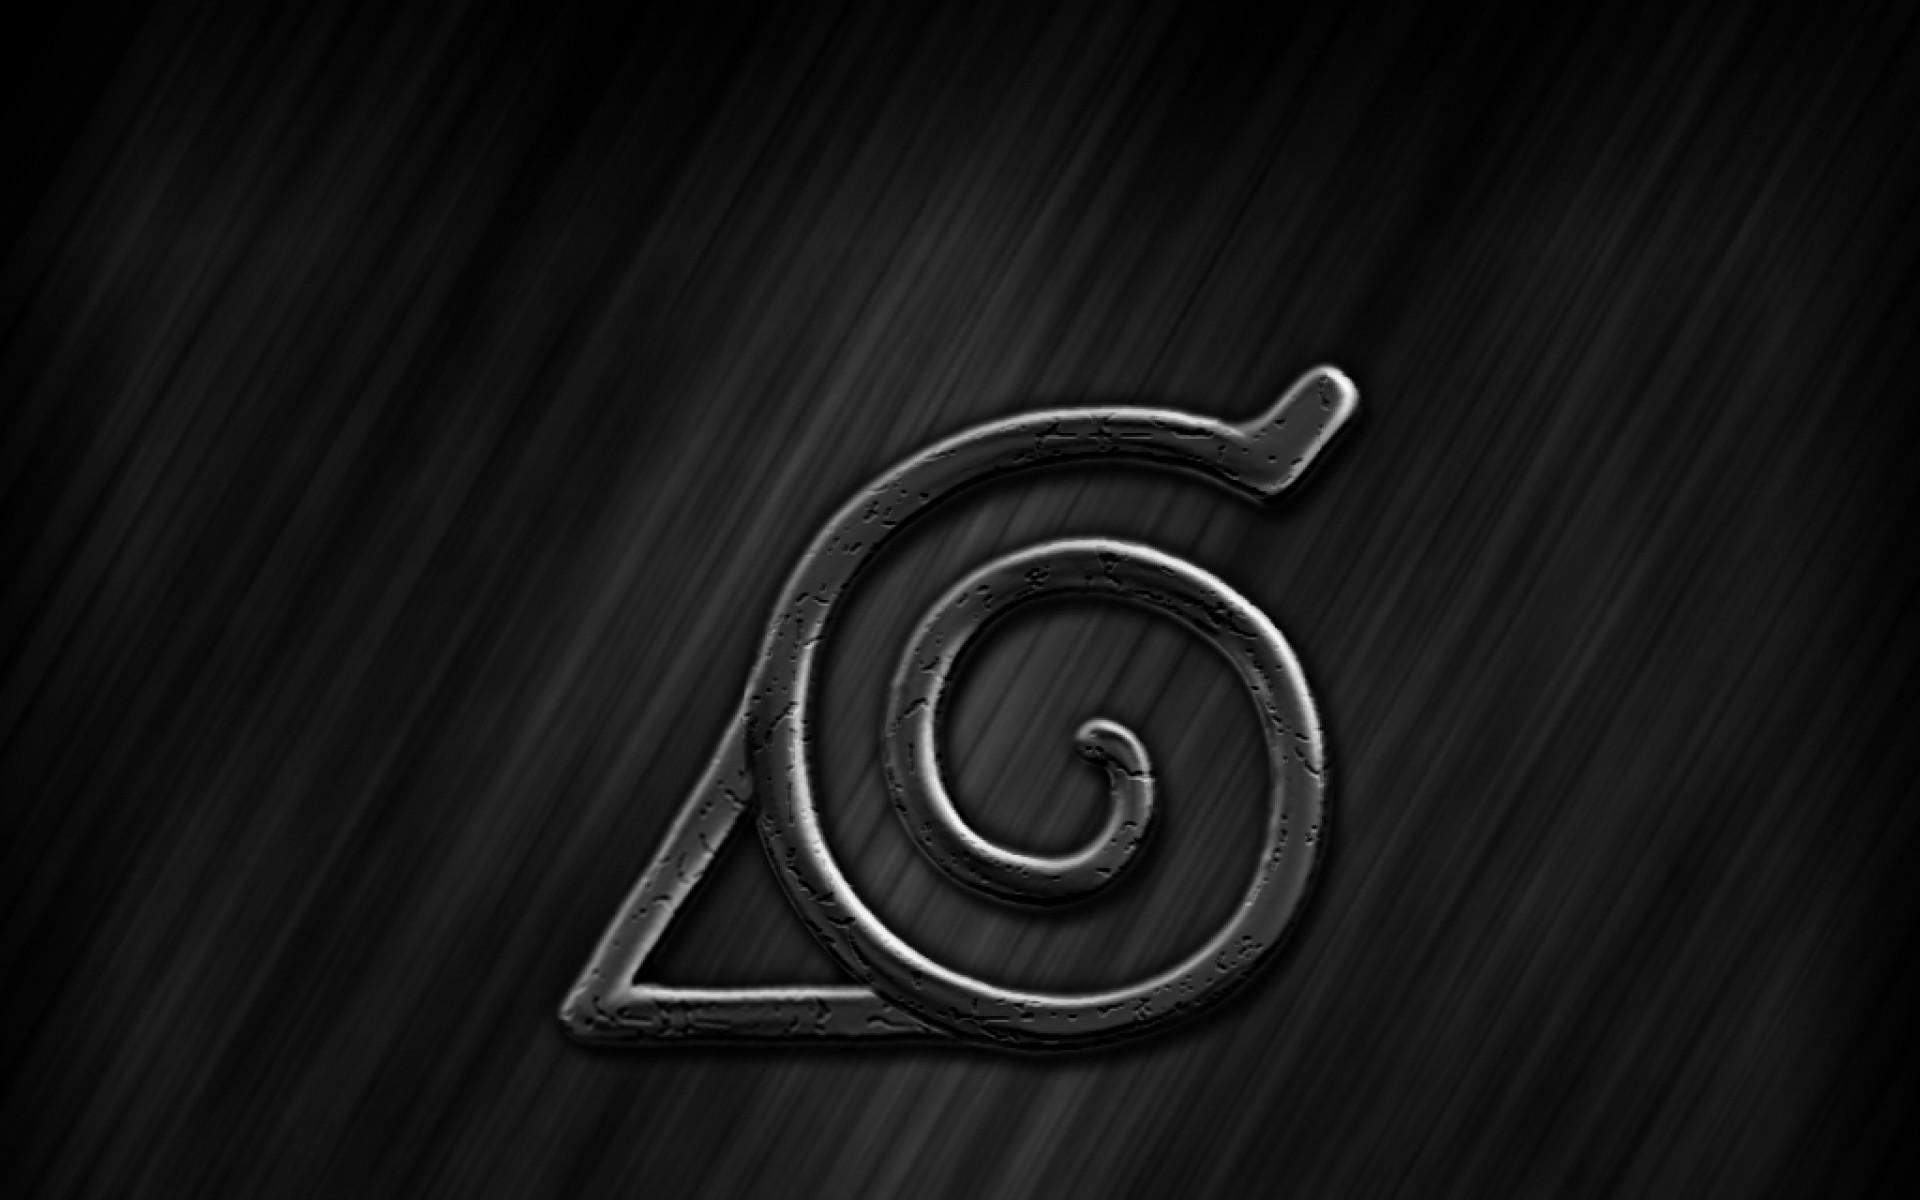 Konohagakure Logo, anmie, Naruto, black 3d background Image Wallpaper